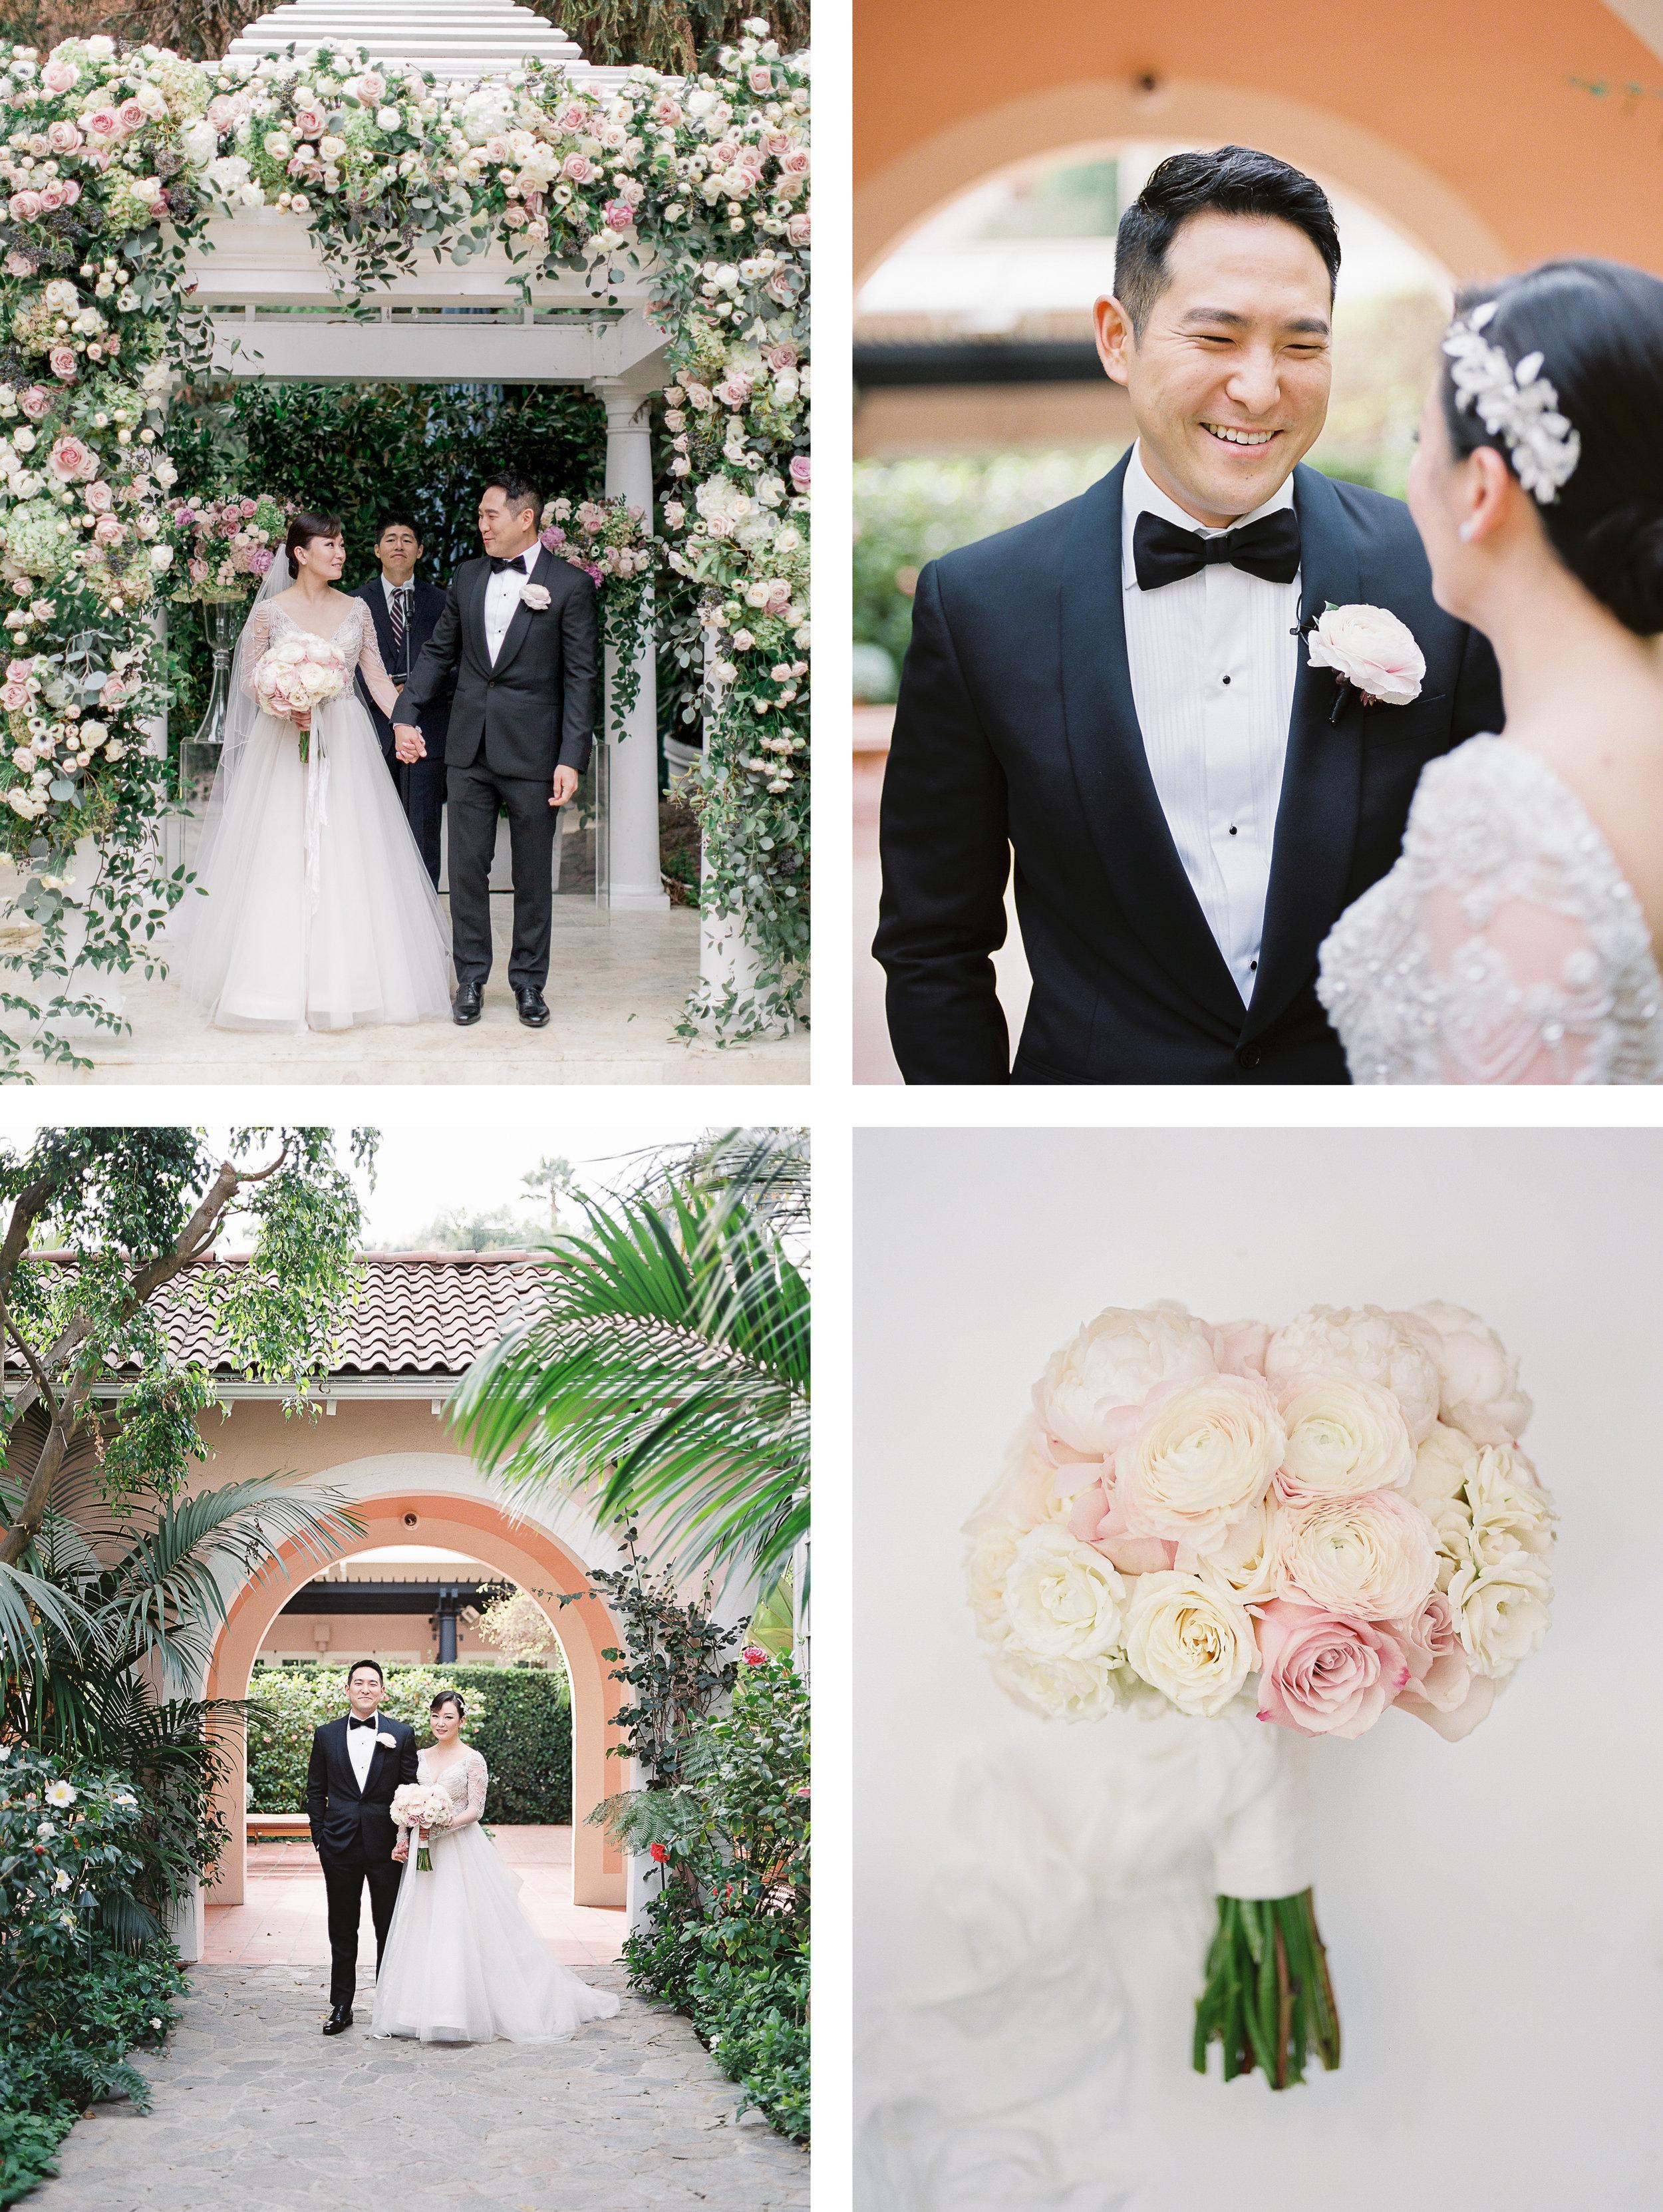 BEL-AIR WEDDING AT HOTEL BEL-AIR - eric + elizabeth